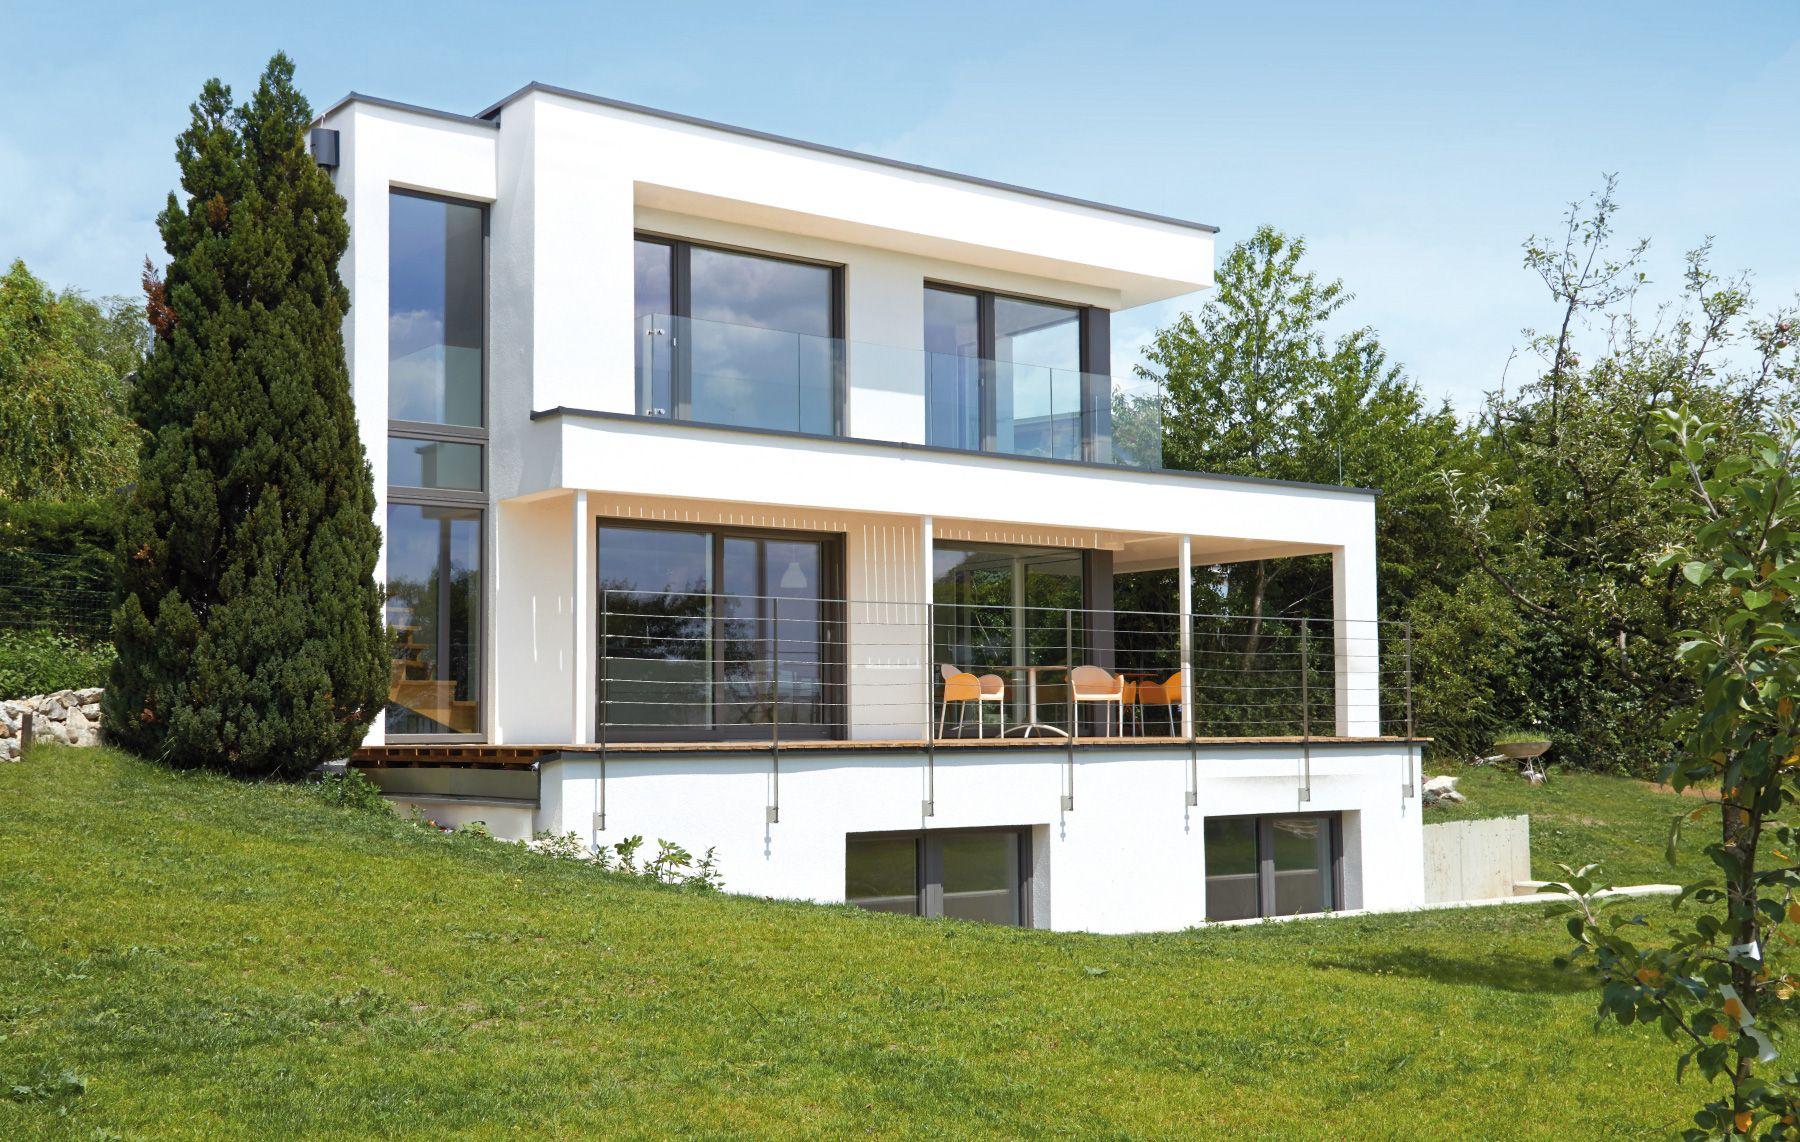 Robinie Kleingartenwohnhäuser Magnum Häuser magnum